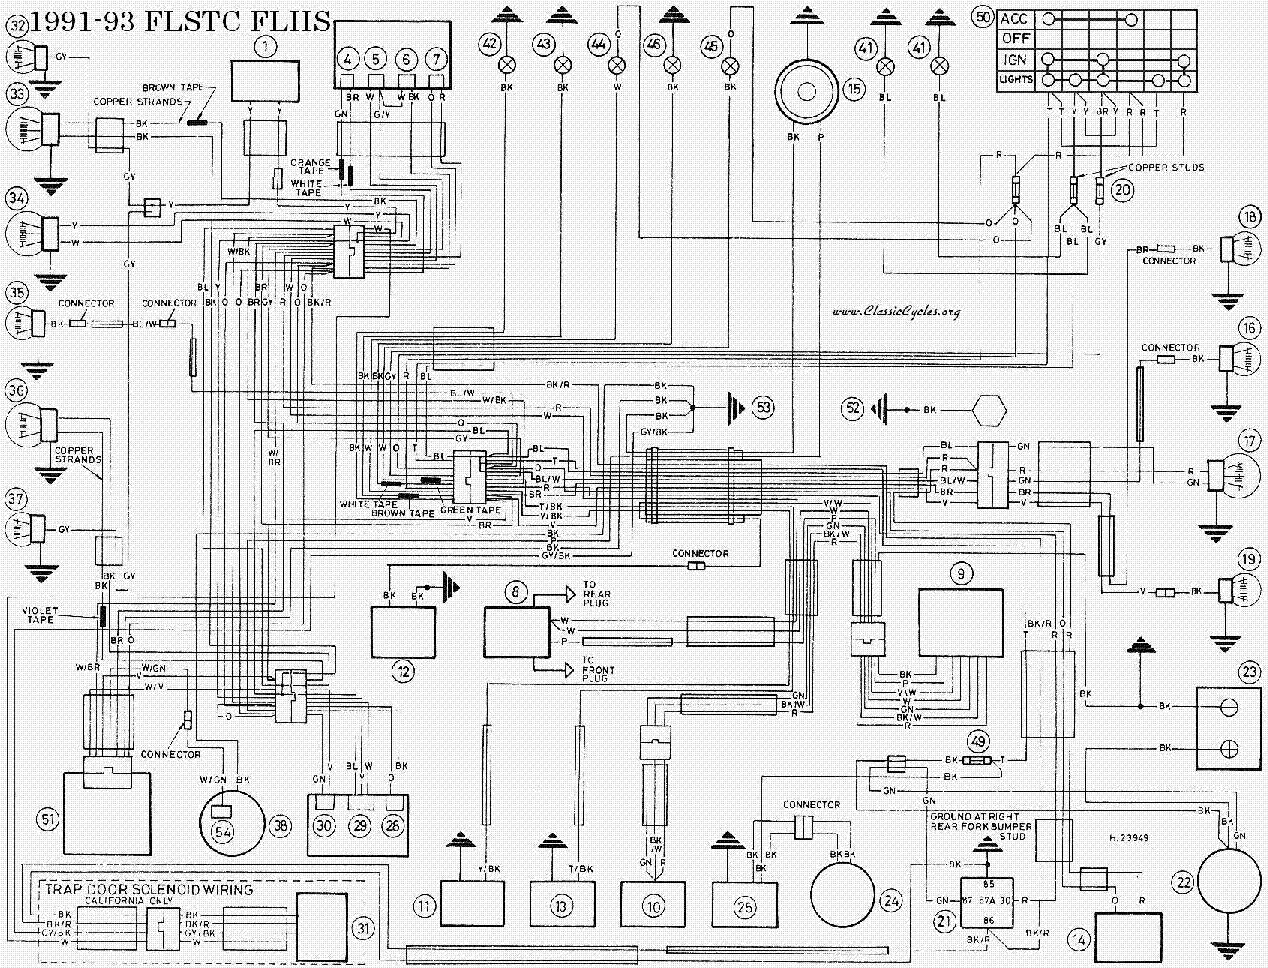 Harley Davidson 1991 93 Flstc Flhs Wiring Diagram Service Manual Simple Download Resize U003d665 2C508